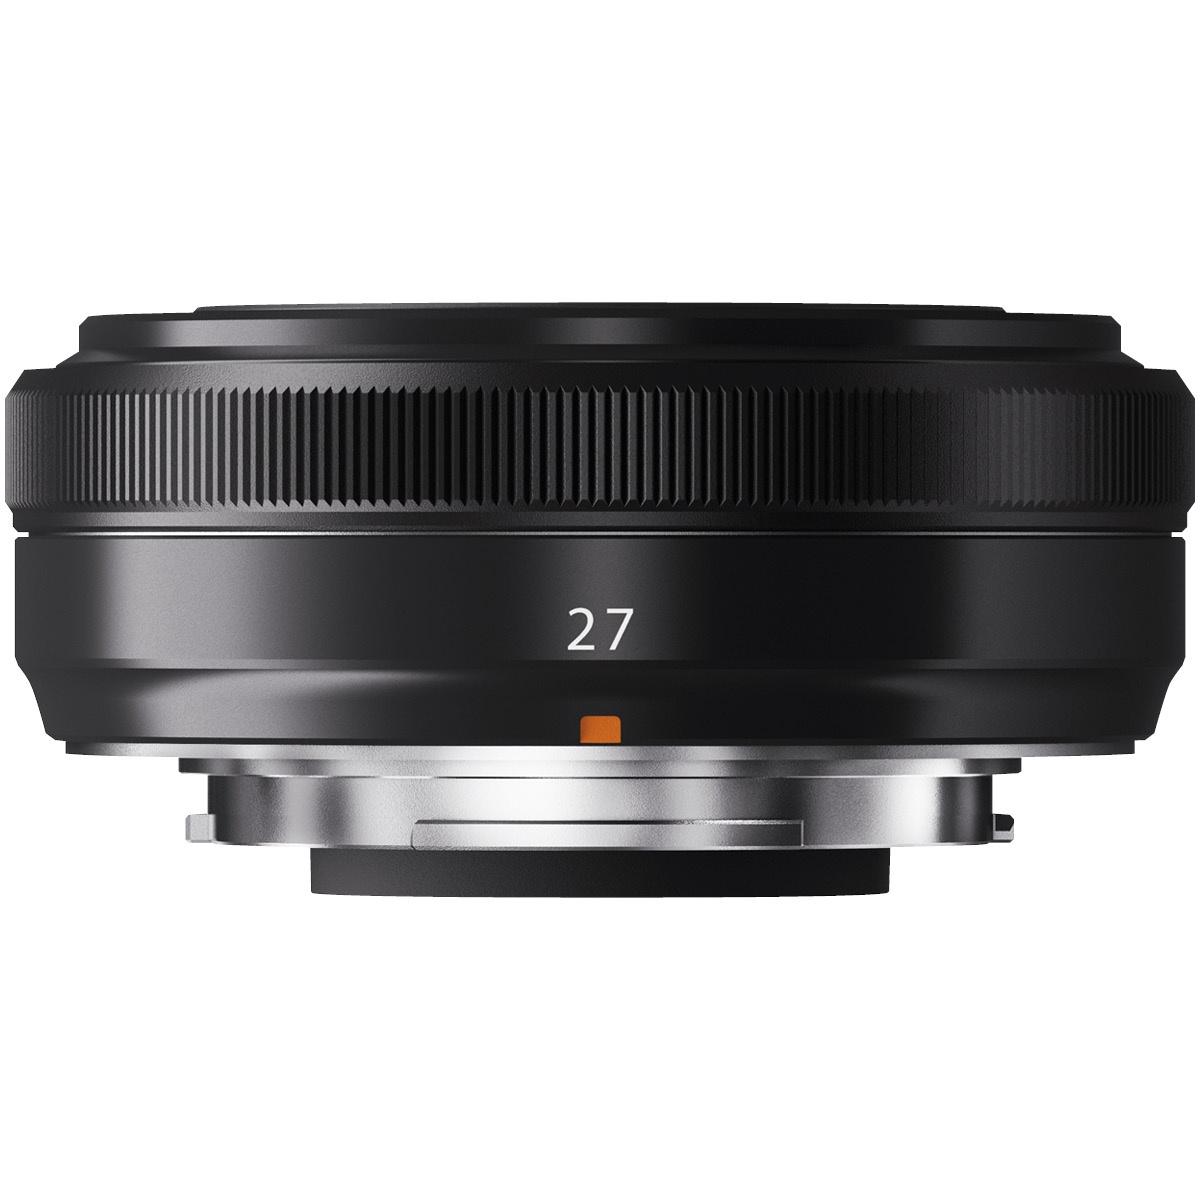 Fujifilm XF 27 mm 1:2,8 schwarz